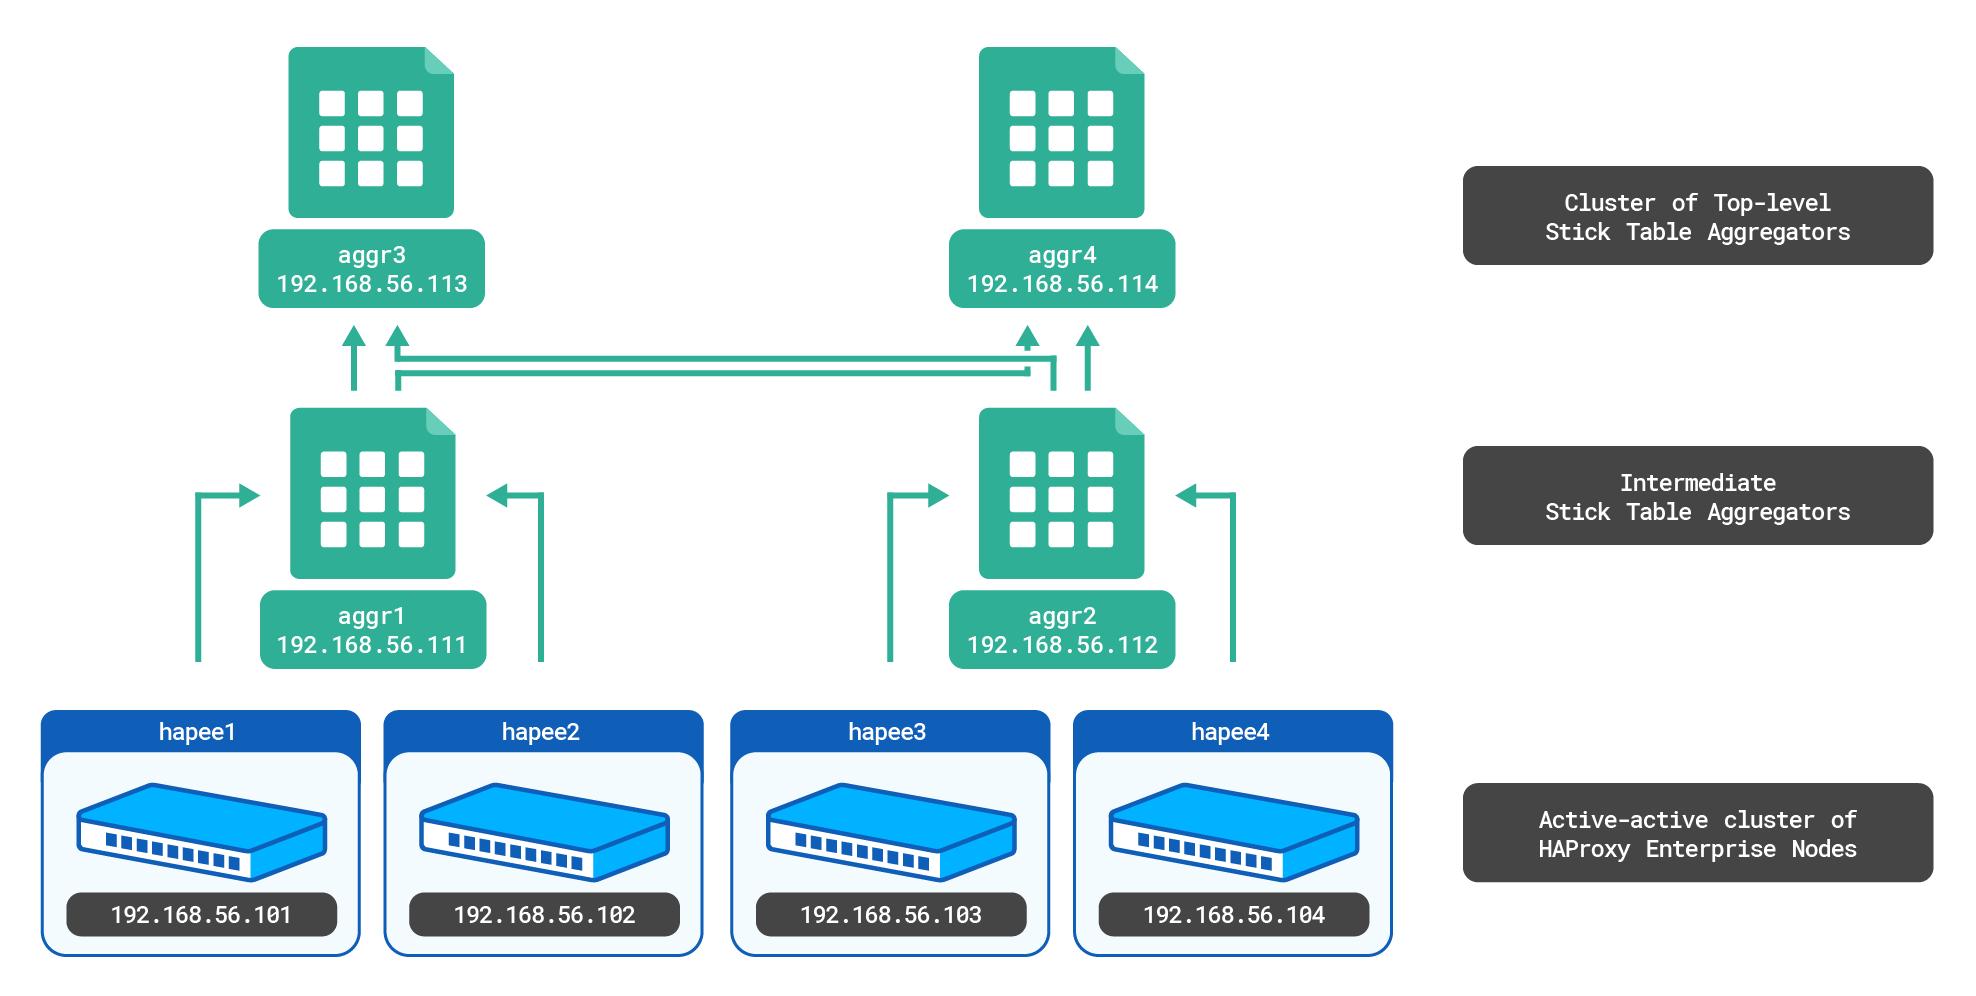 https://cdn.haproxy.com/documentation/hapee/2-0r1/assets/cluster-wide-tracking-ha-setup-3e25d8ecf8c45676e4240bfd3064aa1f880aec0f81fe28afeaf9cd0516086fd7.png